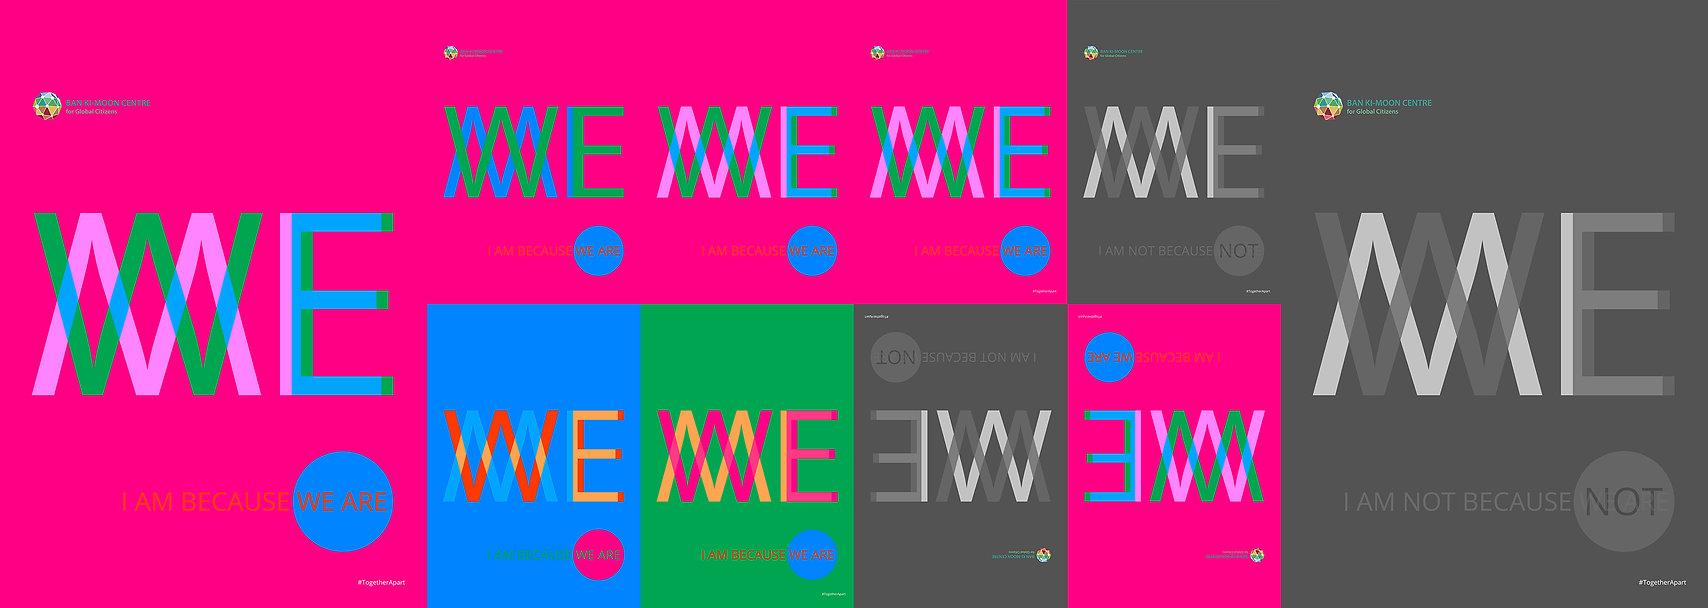 WEME_Iambecauseweare_BannerWebsite.jpg